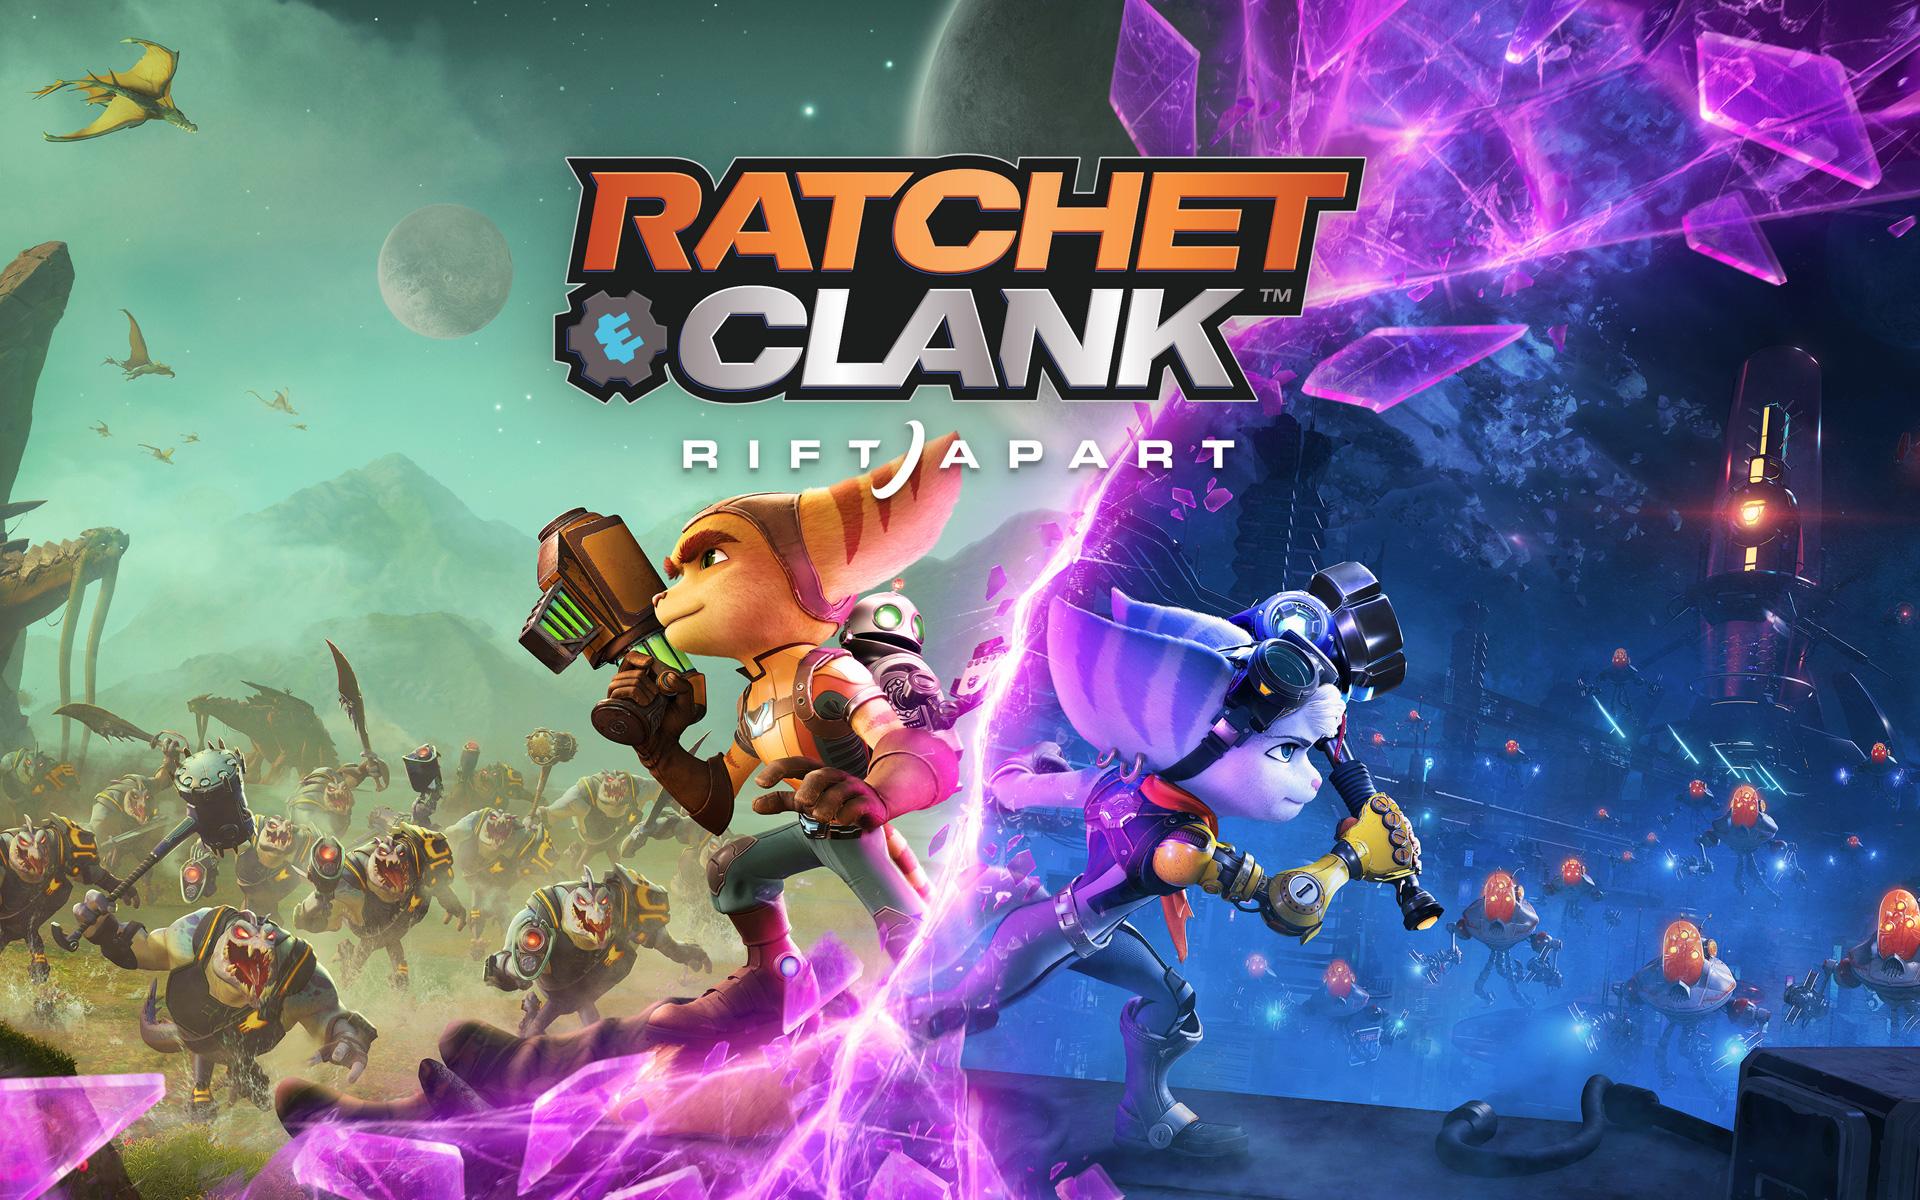 Free Ratchet & Clank: Rift Apart Wallpaper in 1920x1200